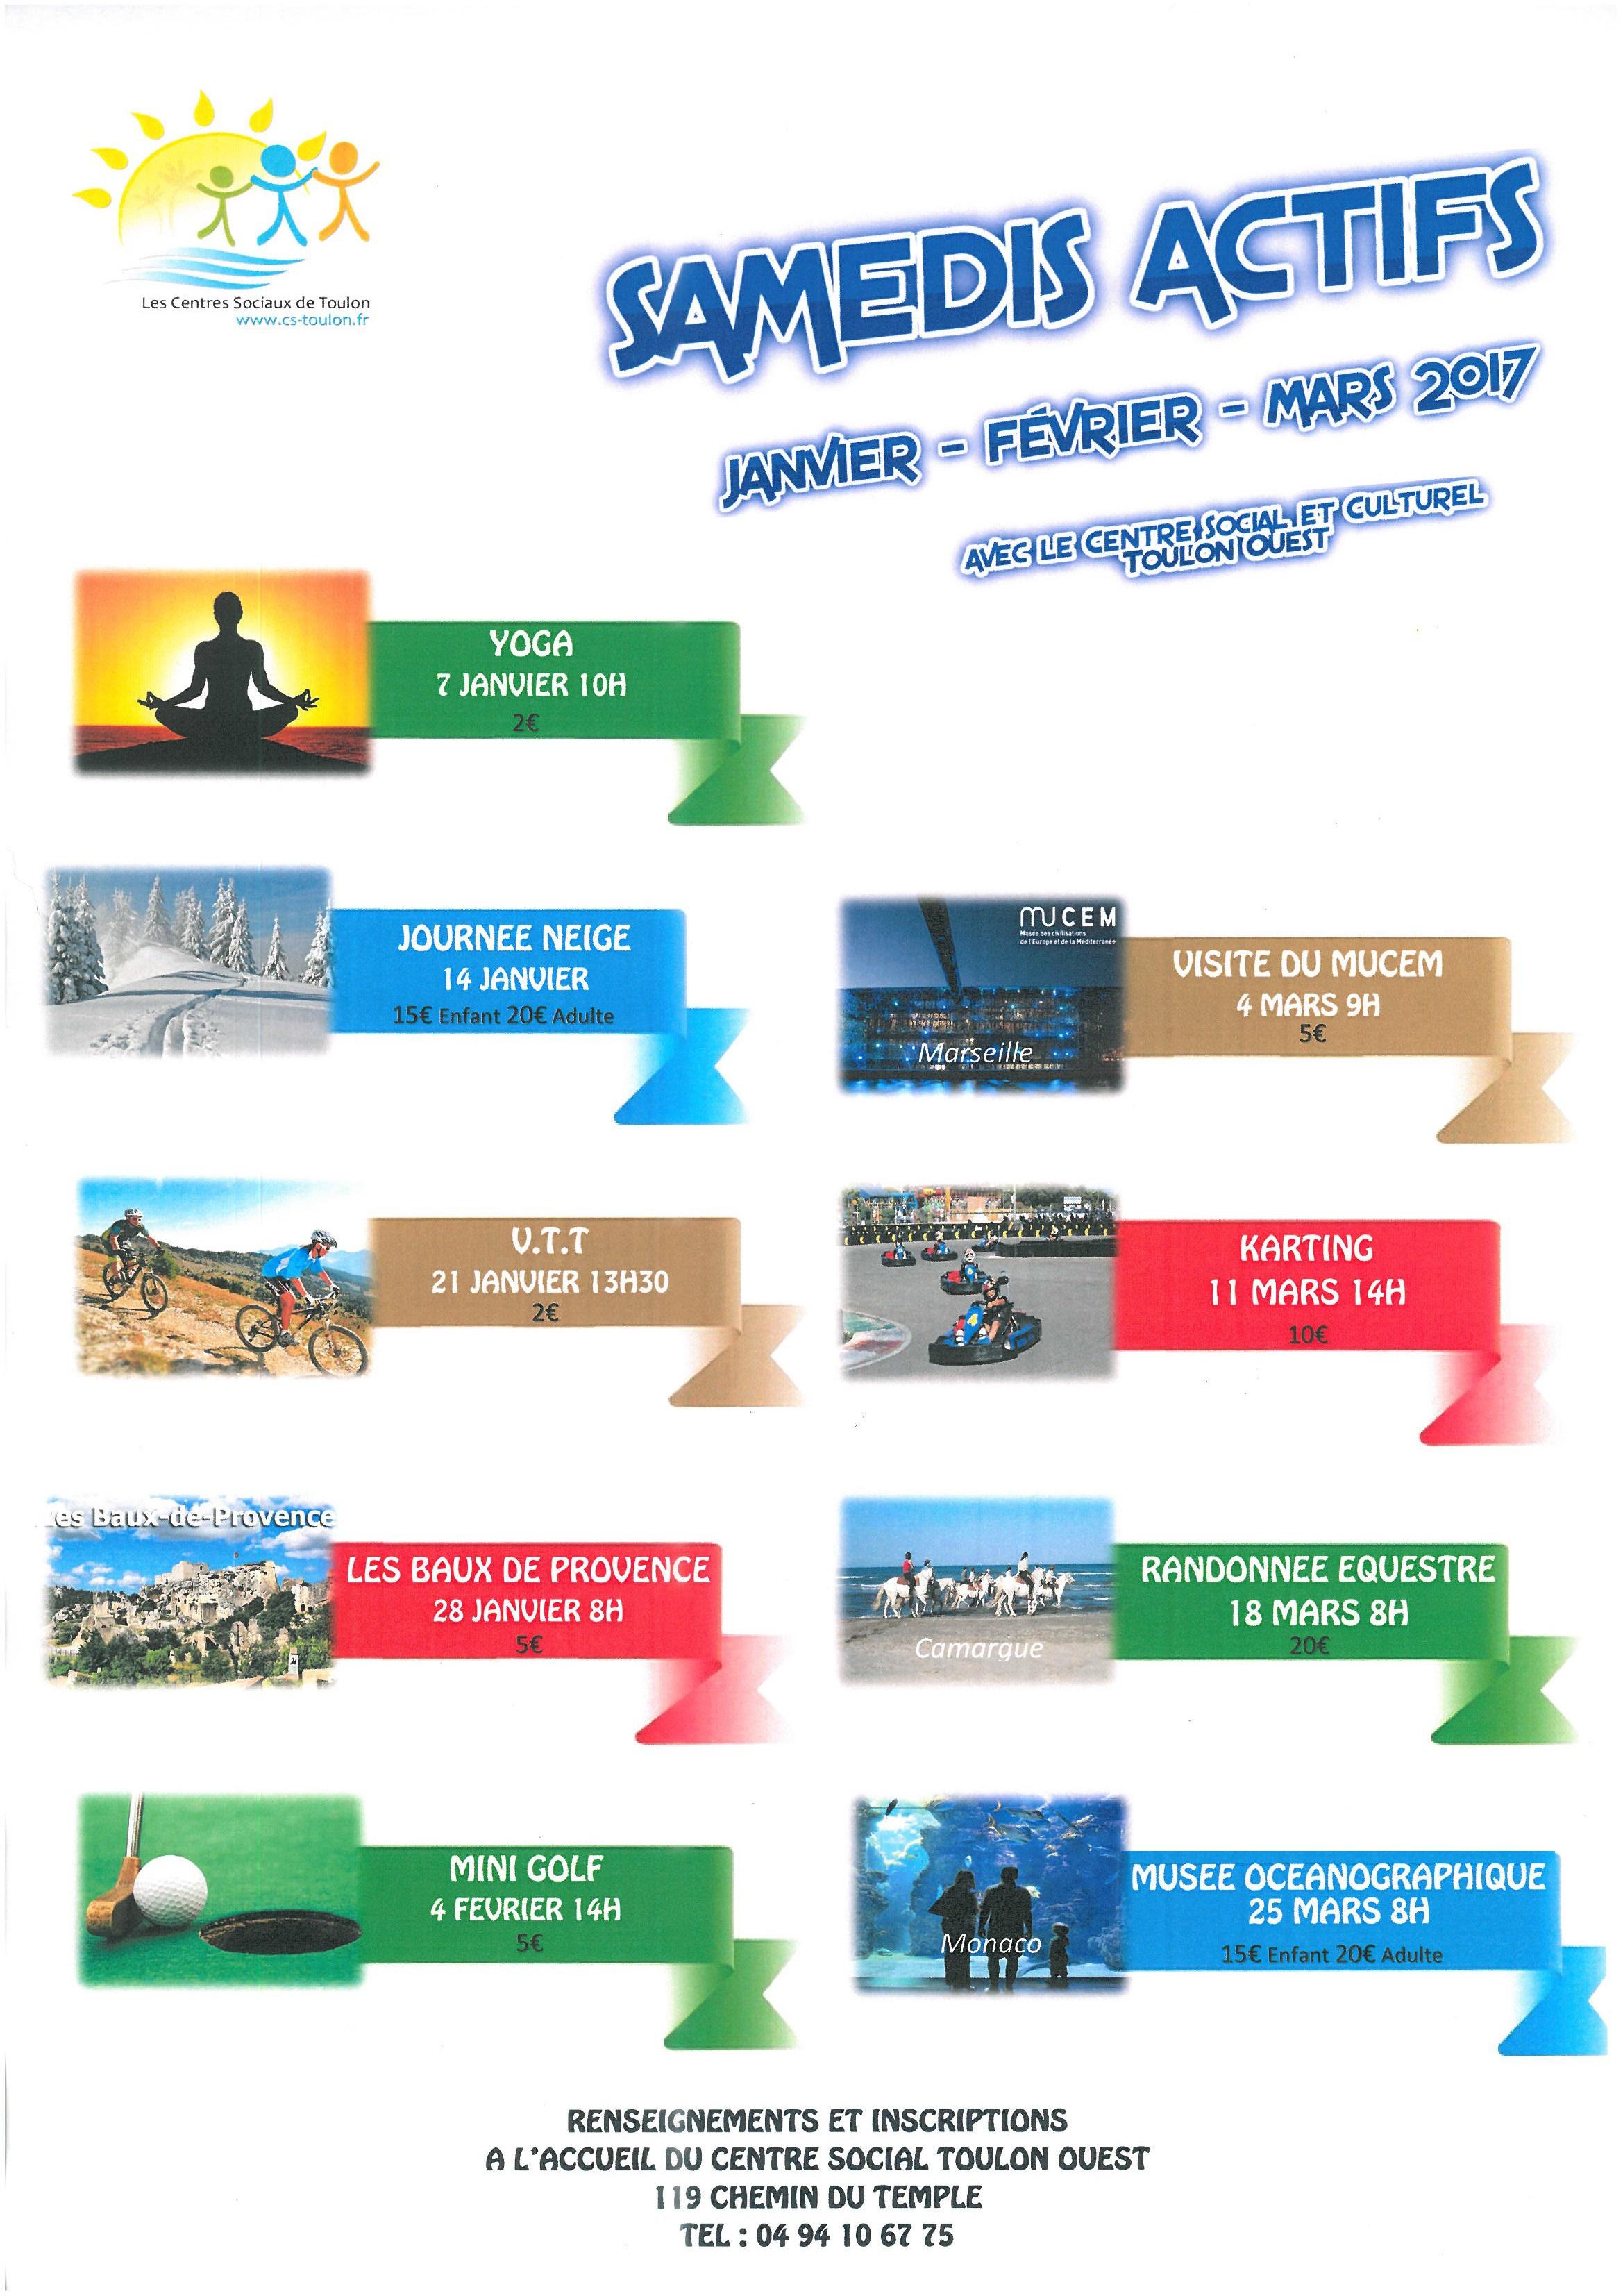 samedis-actifs-2017